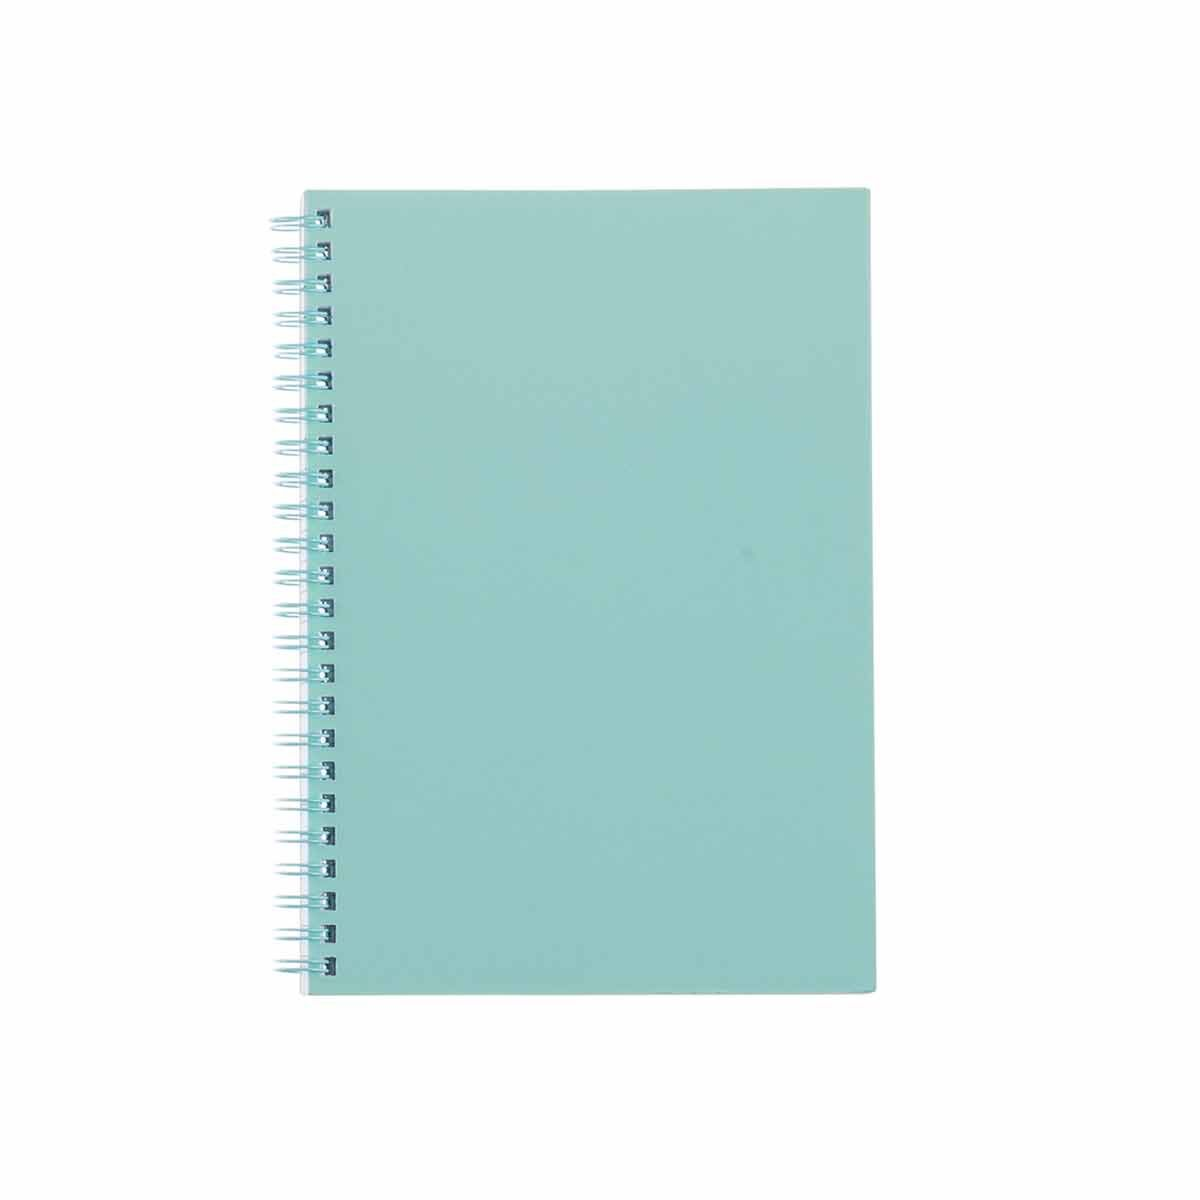 Ryman Pastel Essentials Notebook Ruled A5 Mint